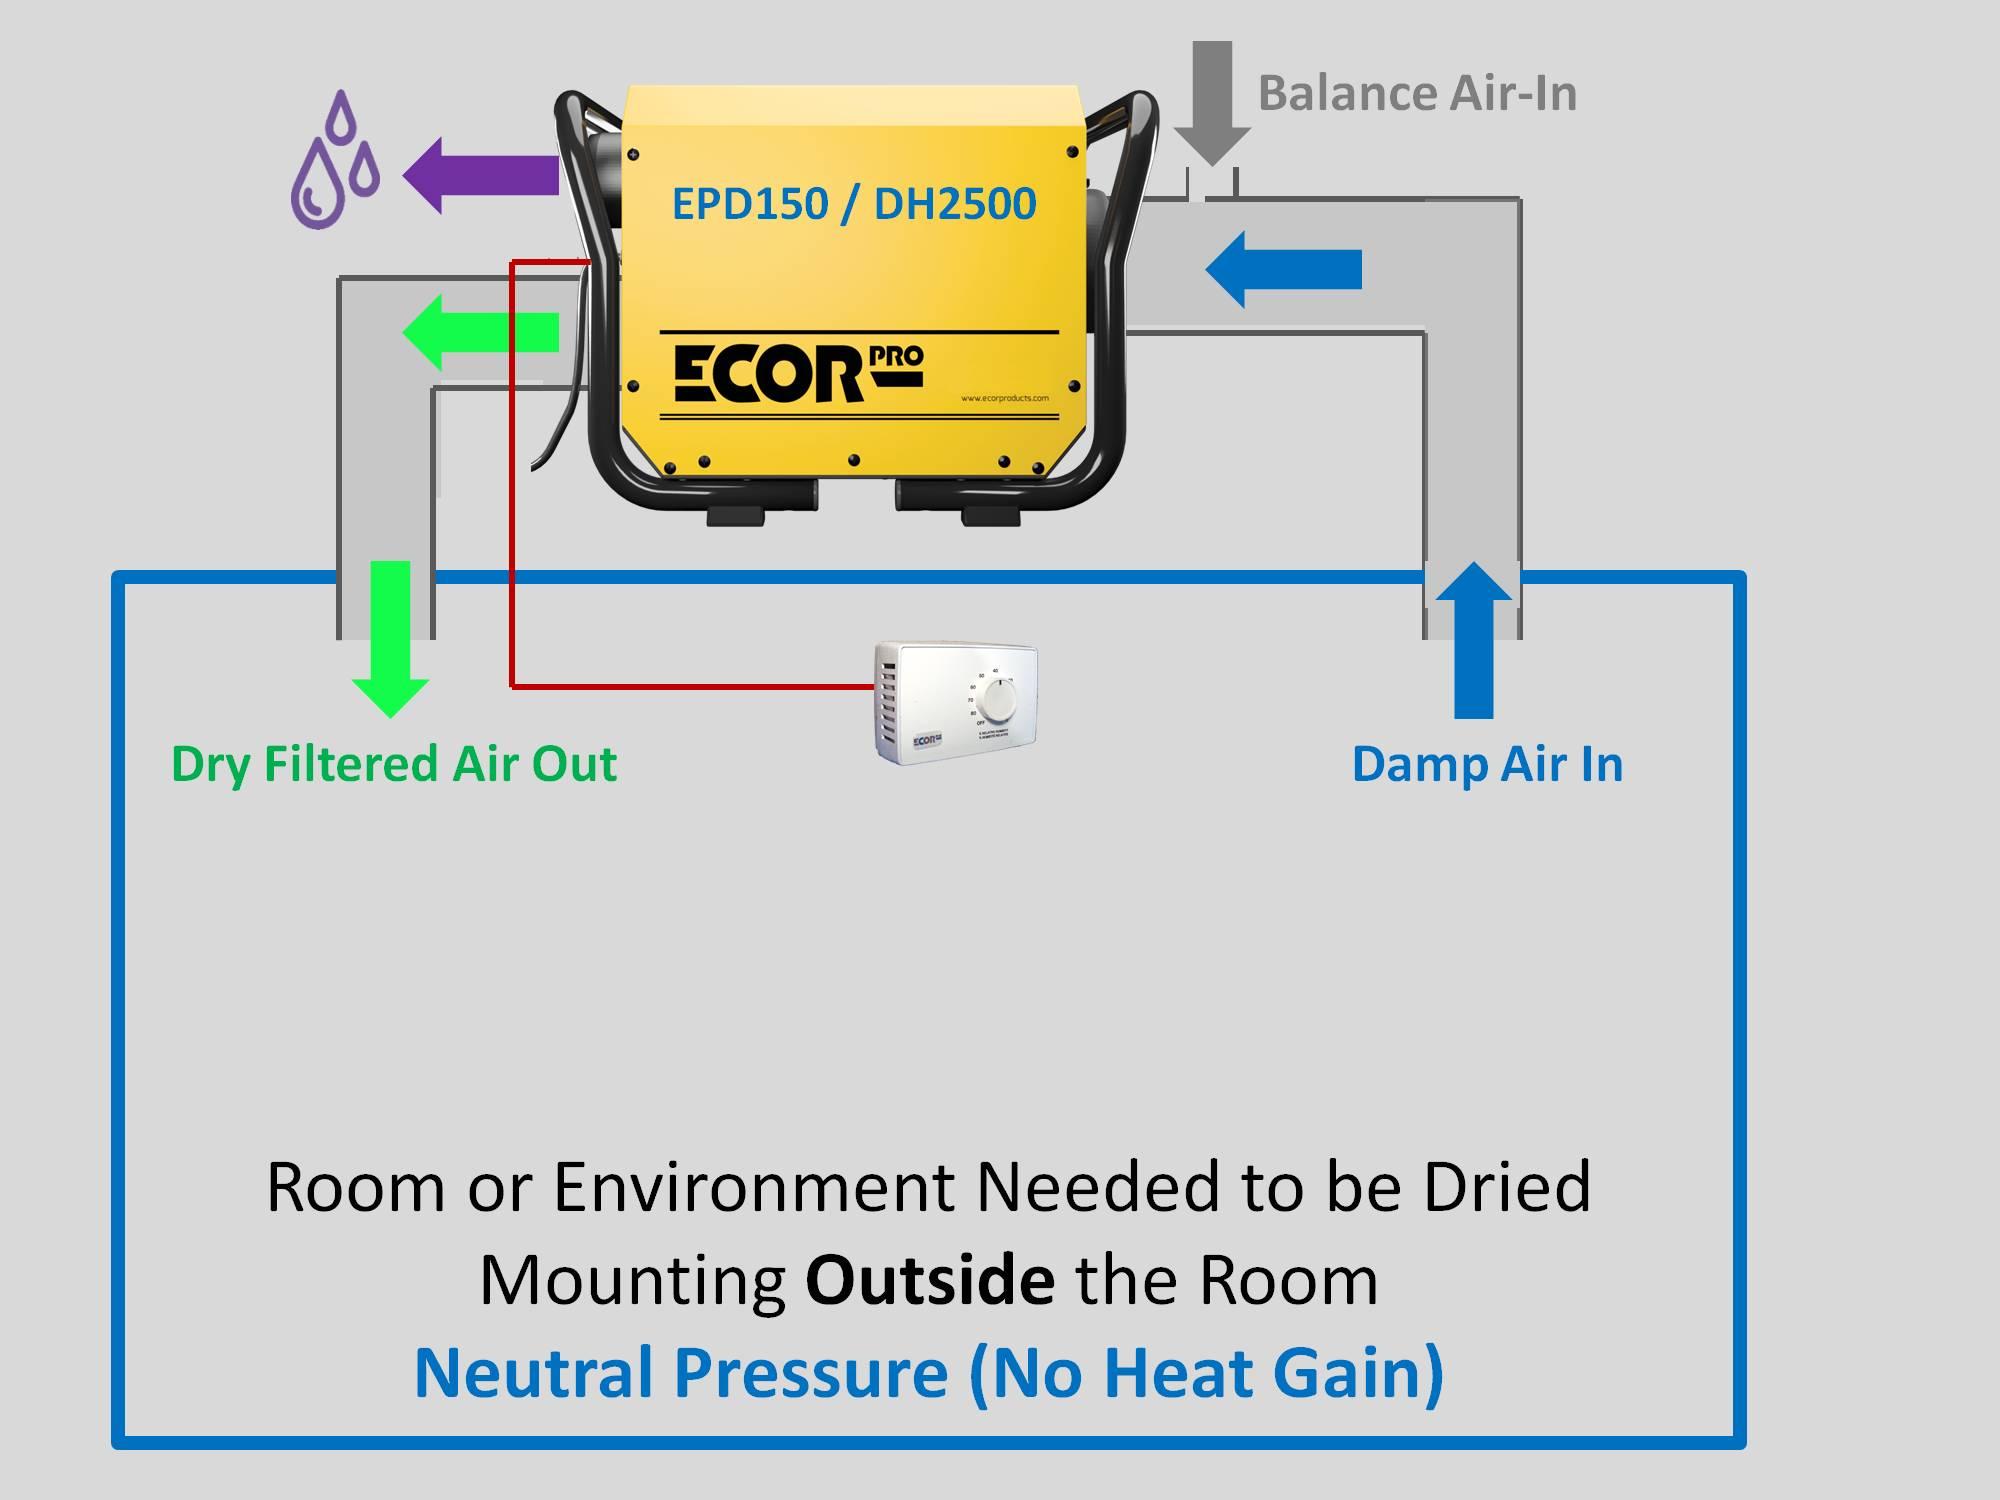 dehumidifier DH2500 EPD150 dehumidifiers by Ecor Pro